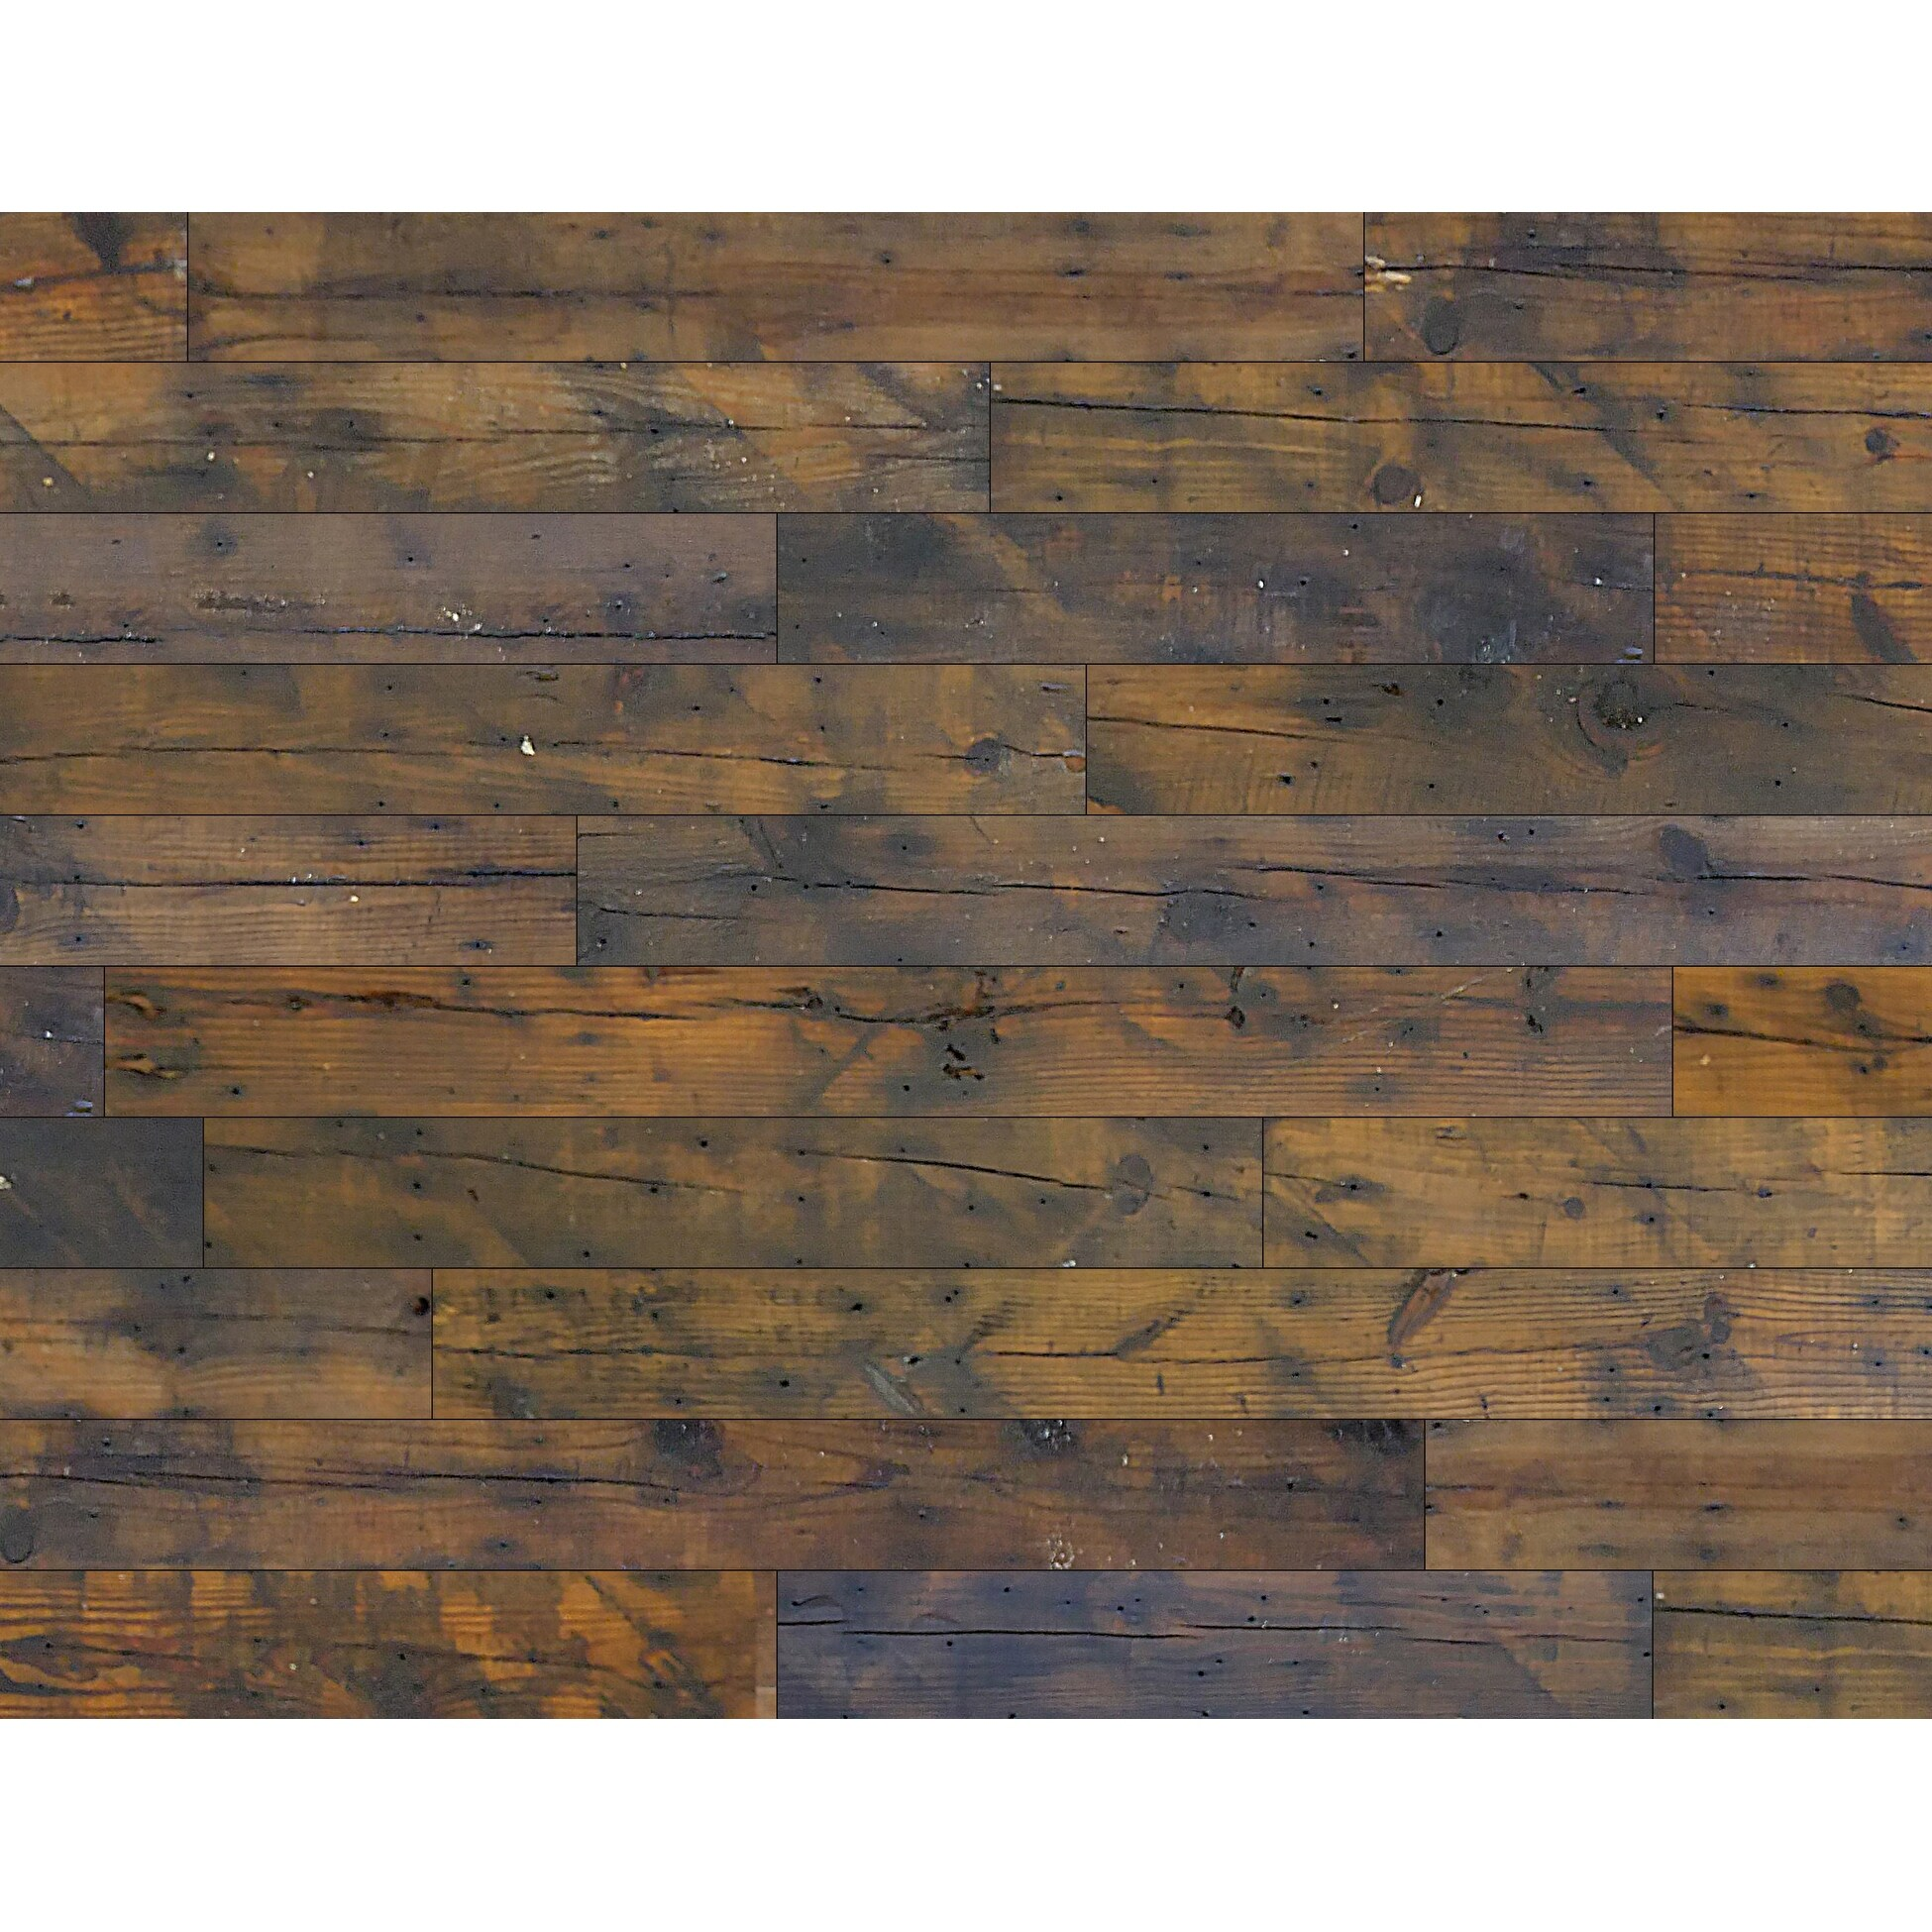 Shop Black Friday Deals On Novogratz Reclaimed Barn Wood Wall Panels Diy 13 3 Sq Ft Of 5 1 Wide Panels Overstock 31961286